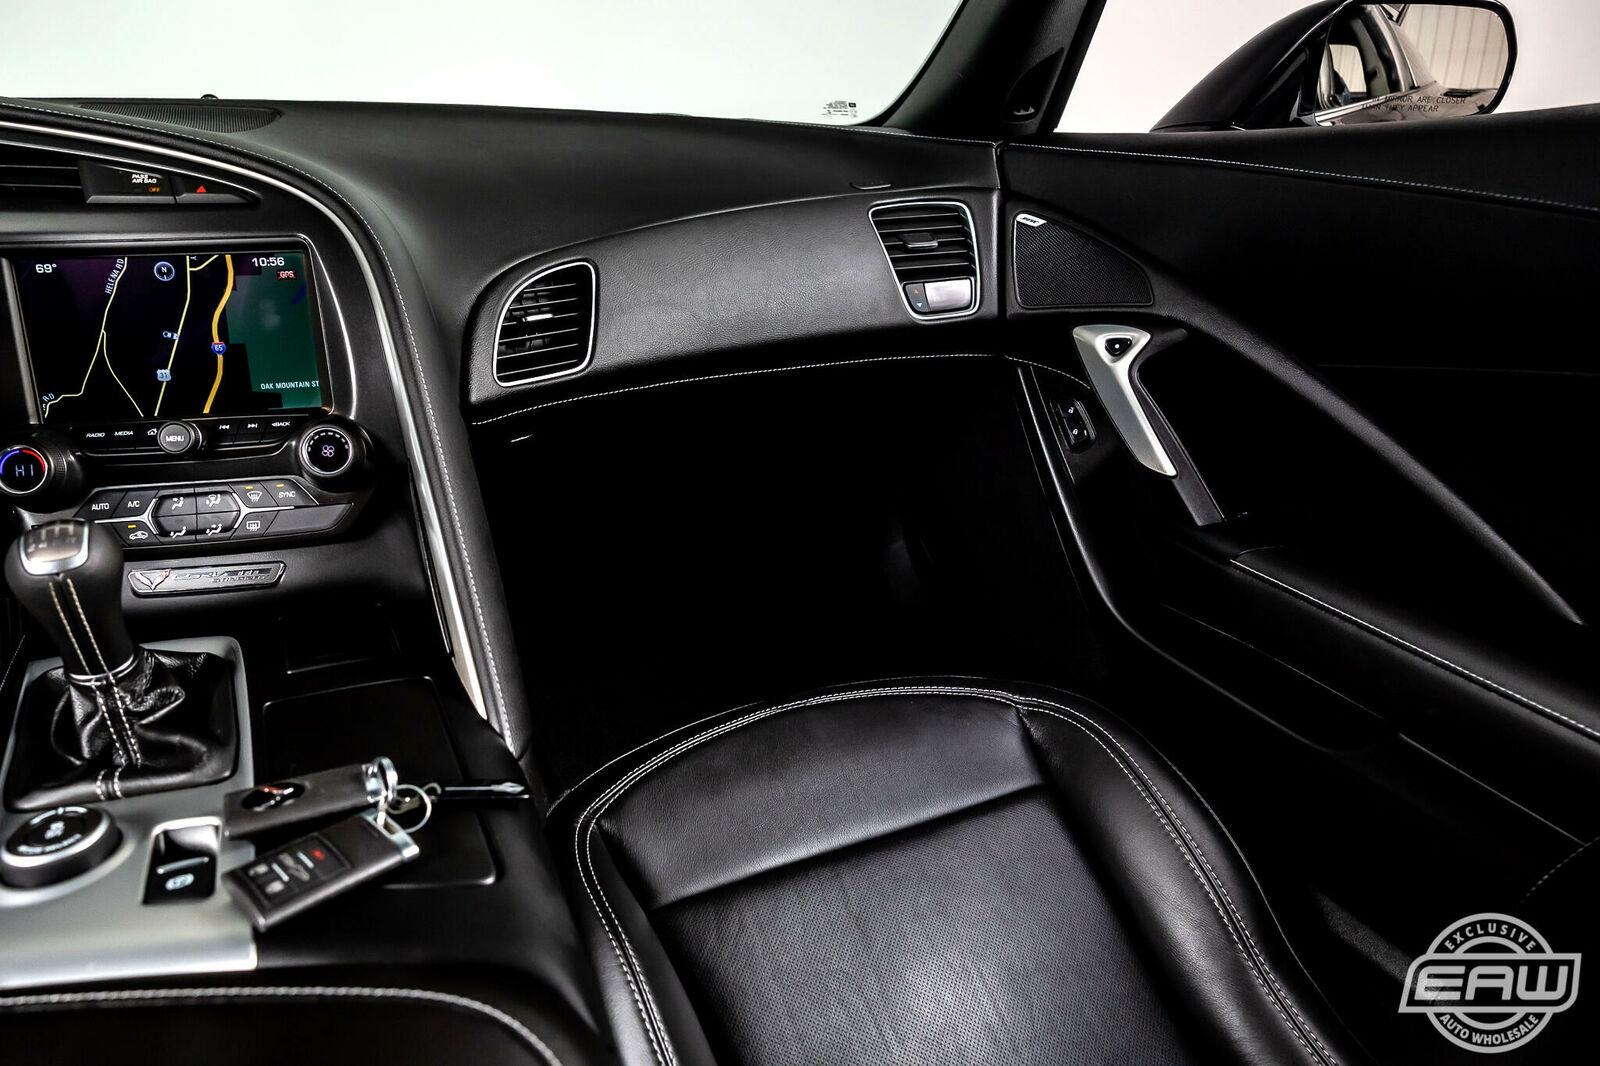 2014 Black Chevrolet Corvette Coupe 1LT | C7 Corvette Photo 8